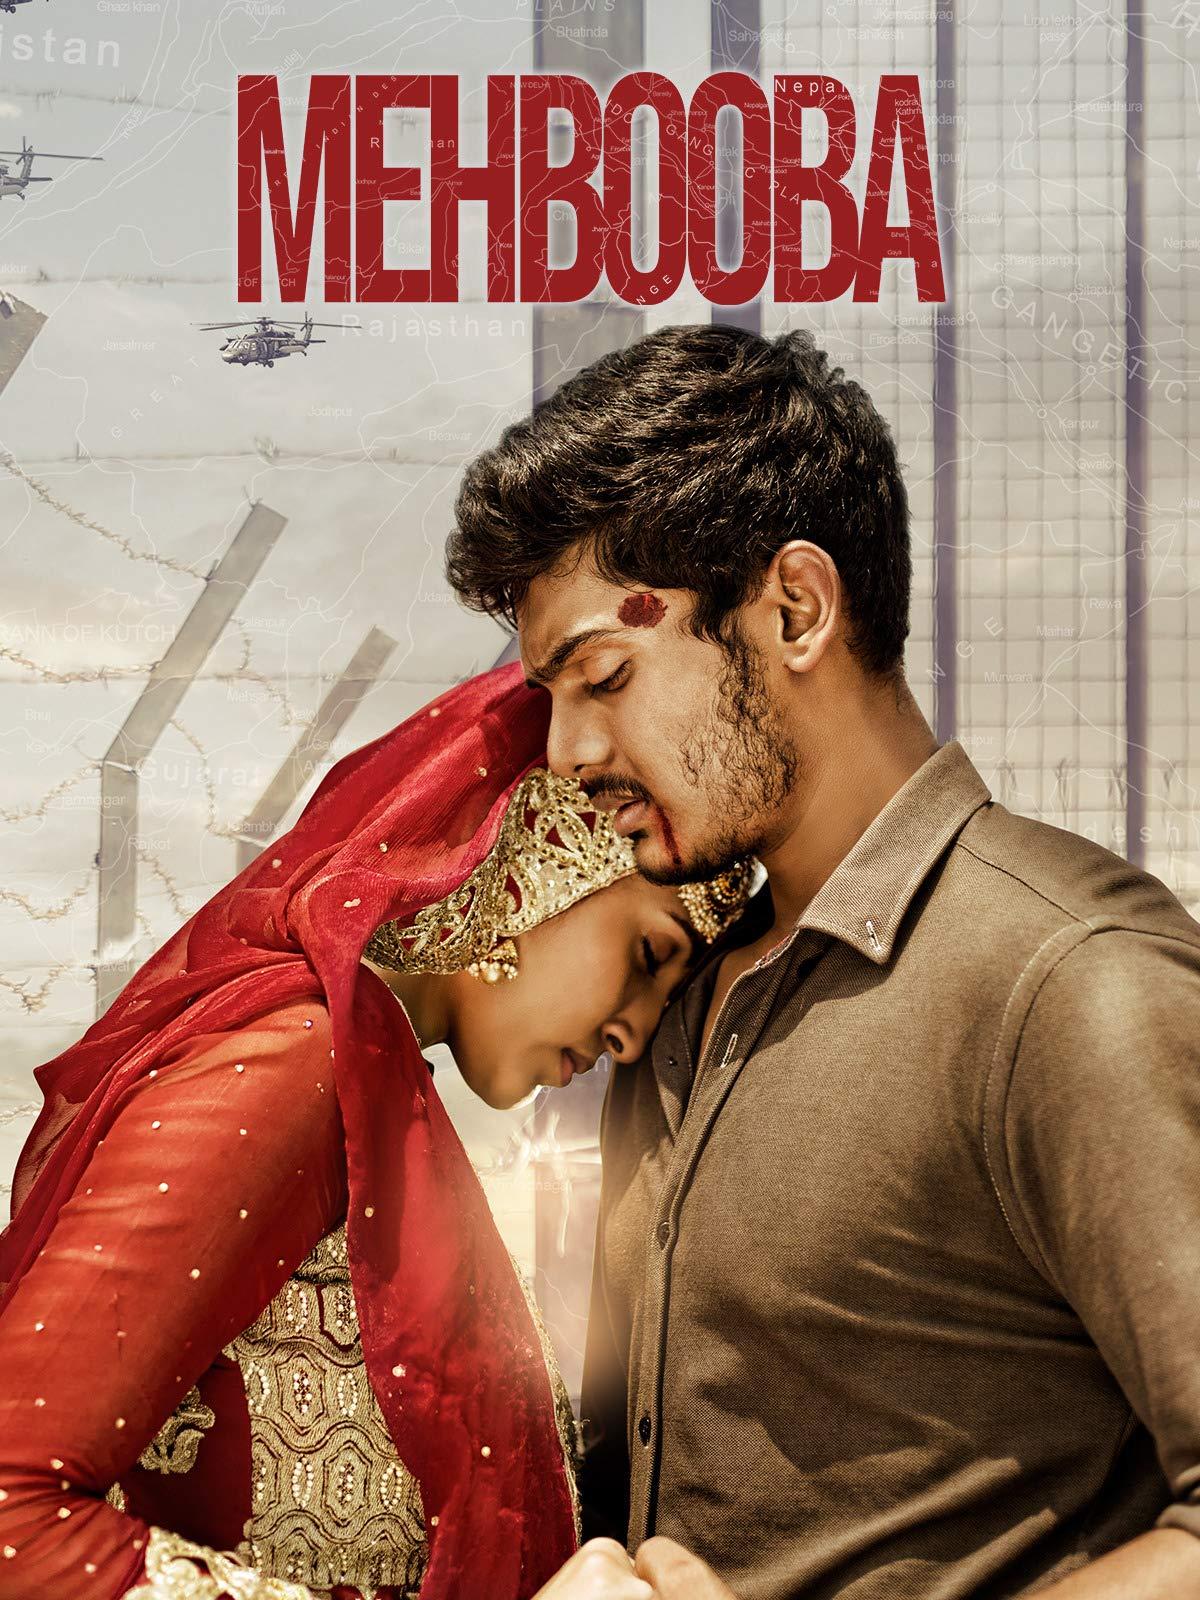 Mehbooba (2018) Hindi Dubbed HDRip 350MB Download